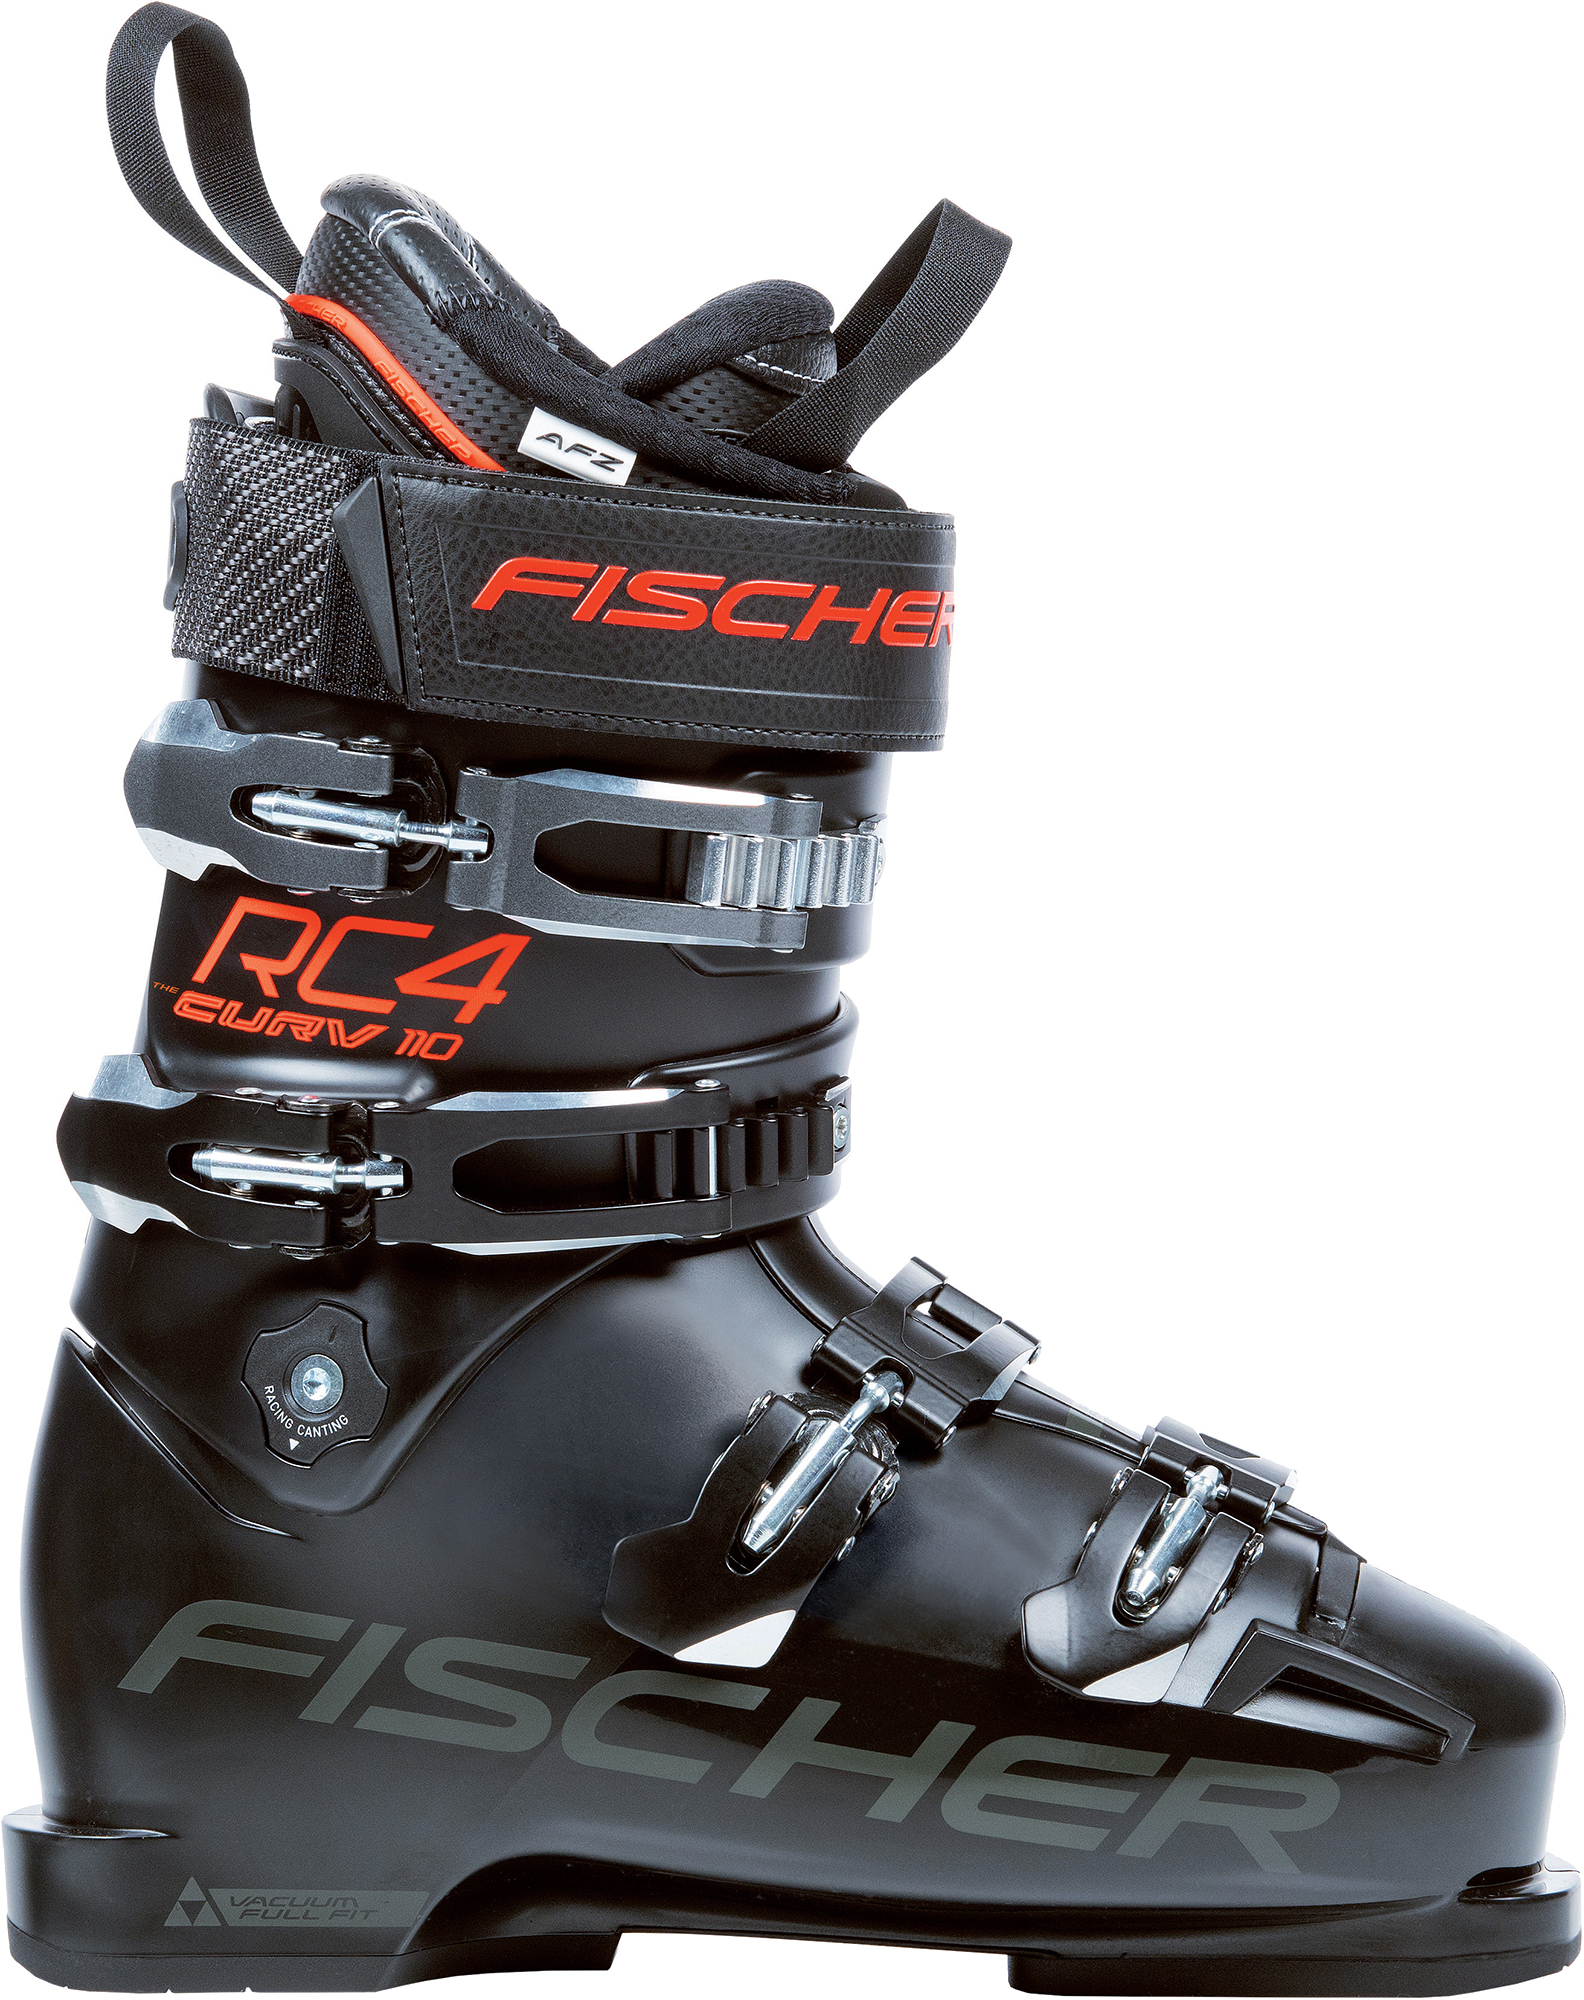 Fischer Ботинки горнолыжные Rc4 Curv 110 Vacuum Full Fit, размер 44